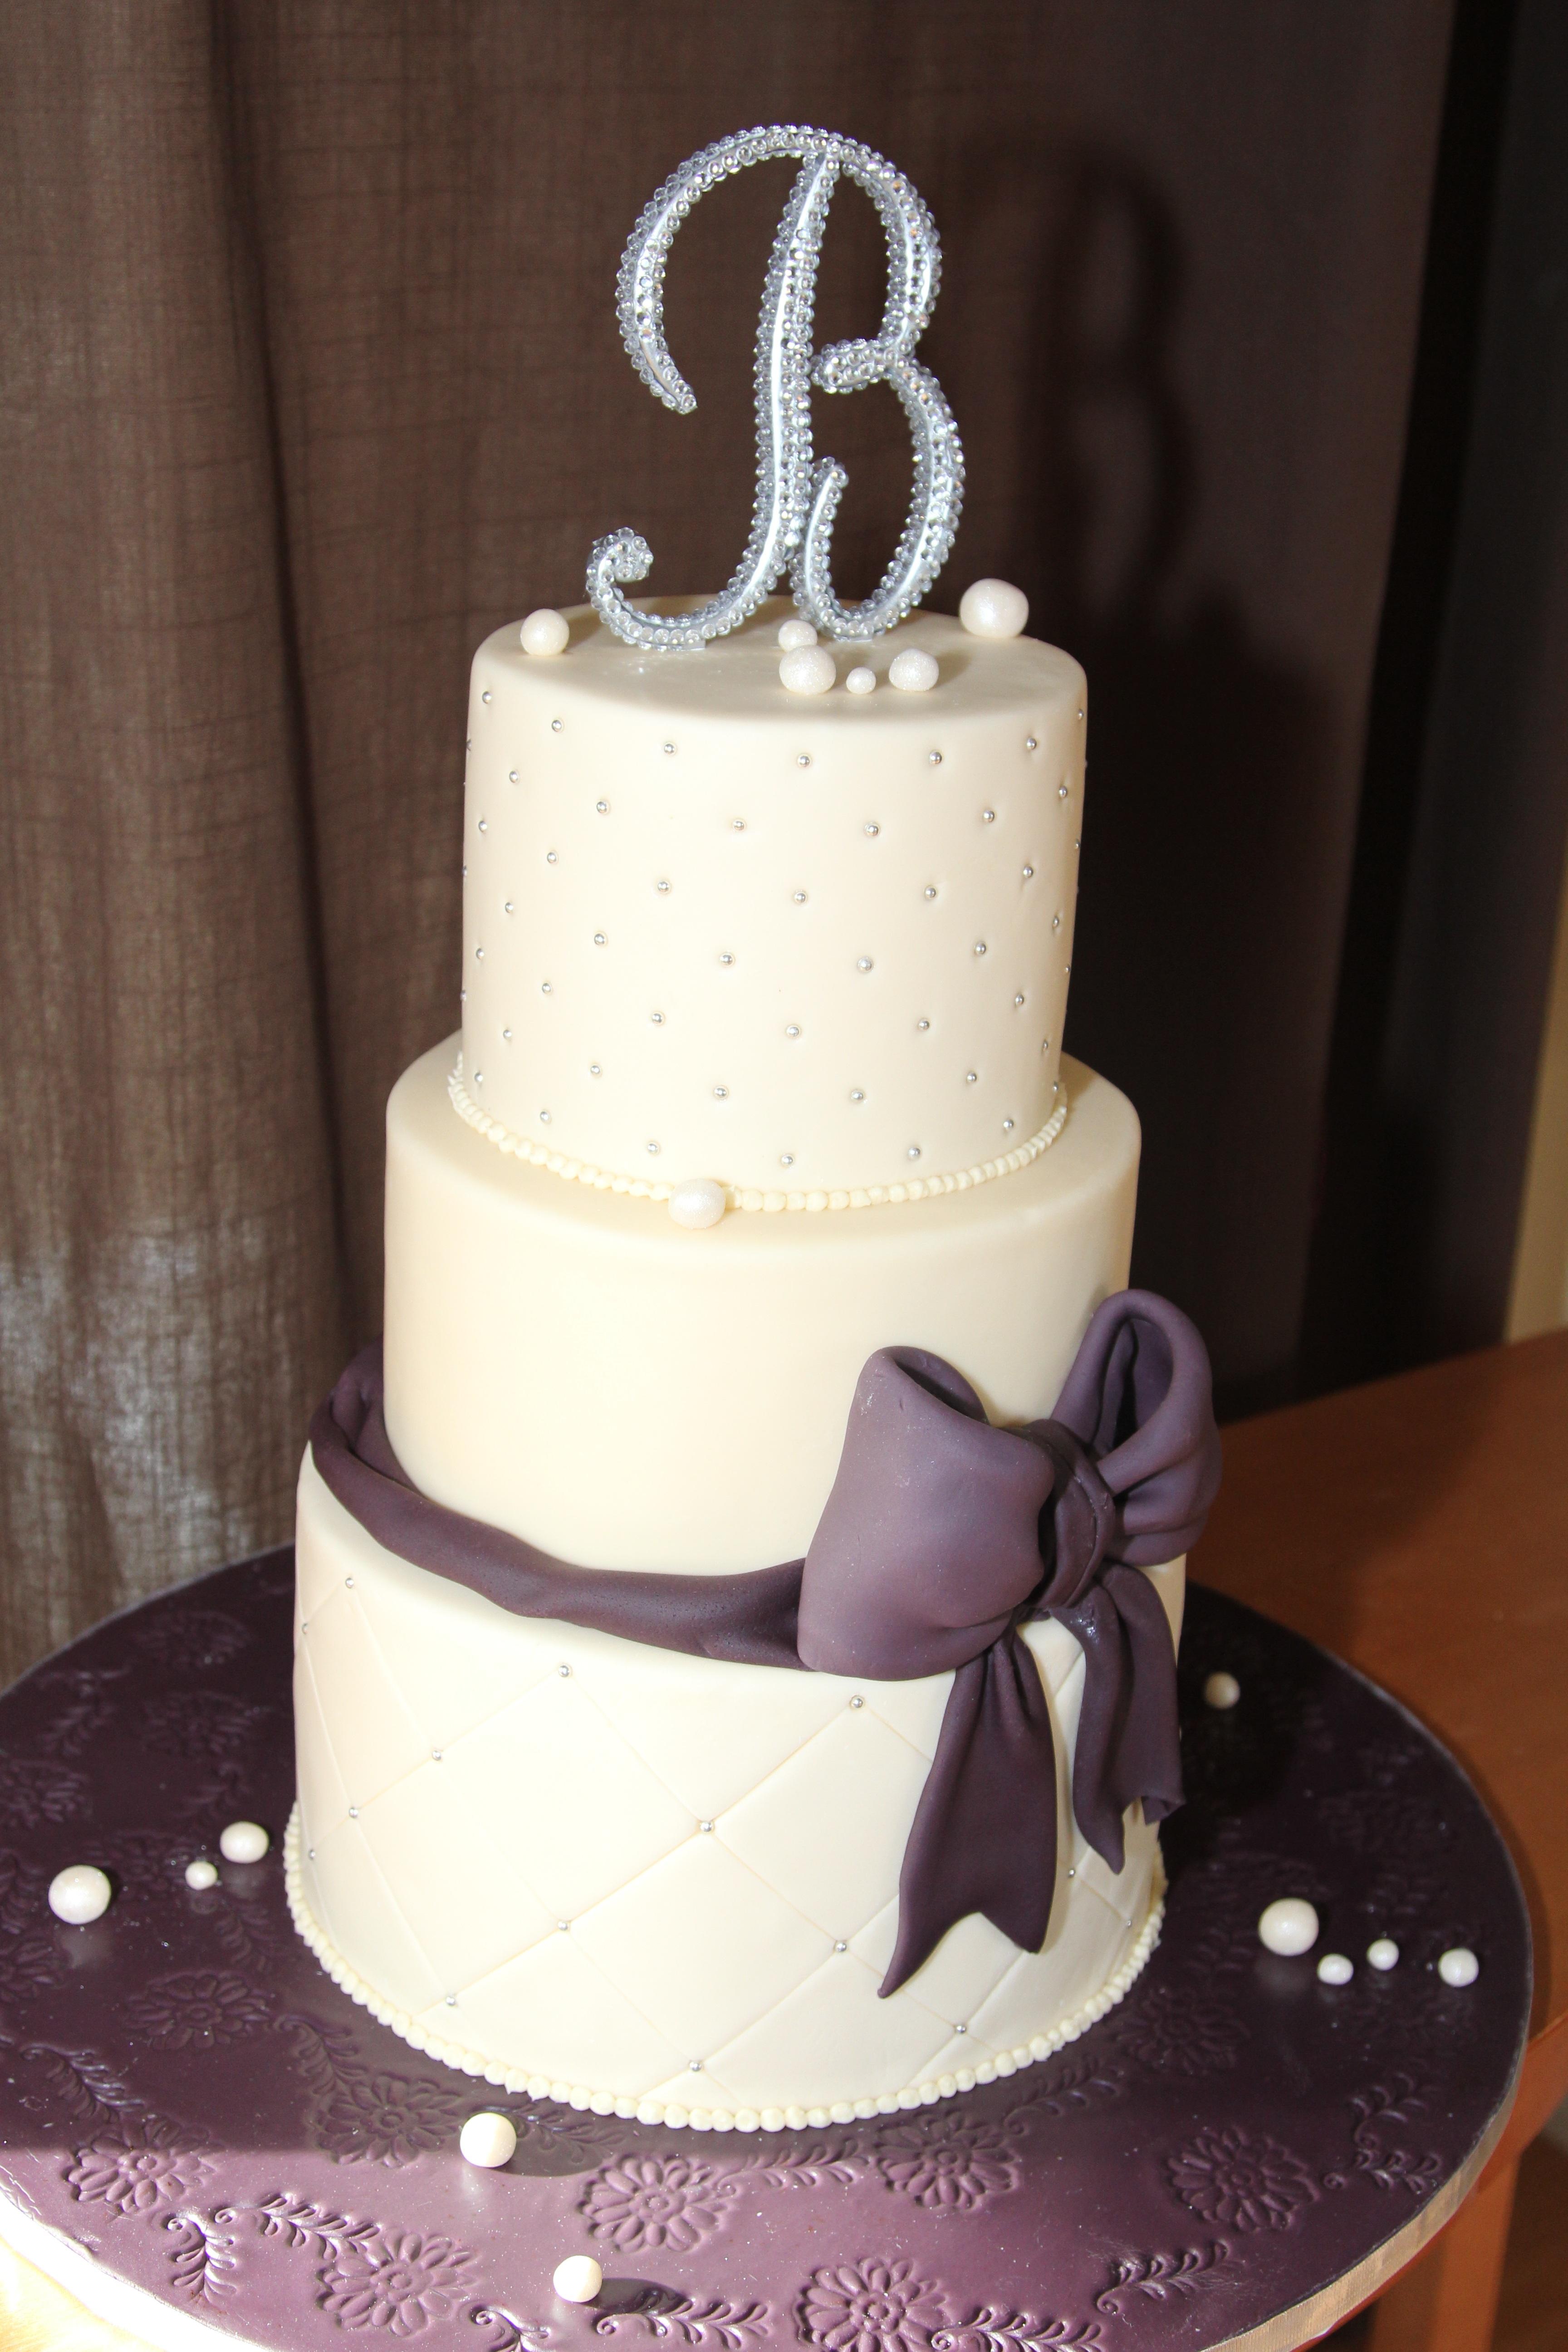 Free Images : sweet, celebration, food, pink, chocolate, dessert ...